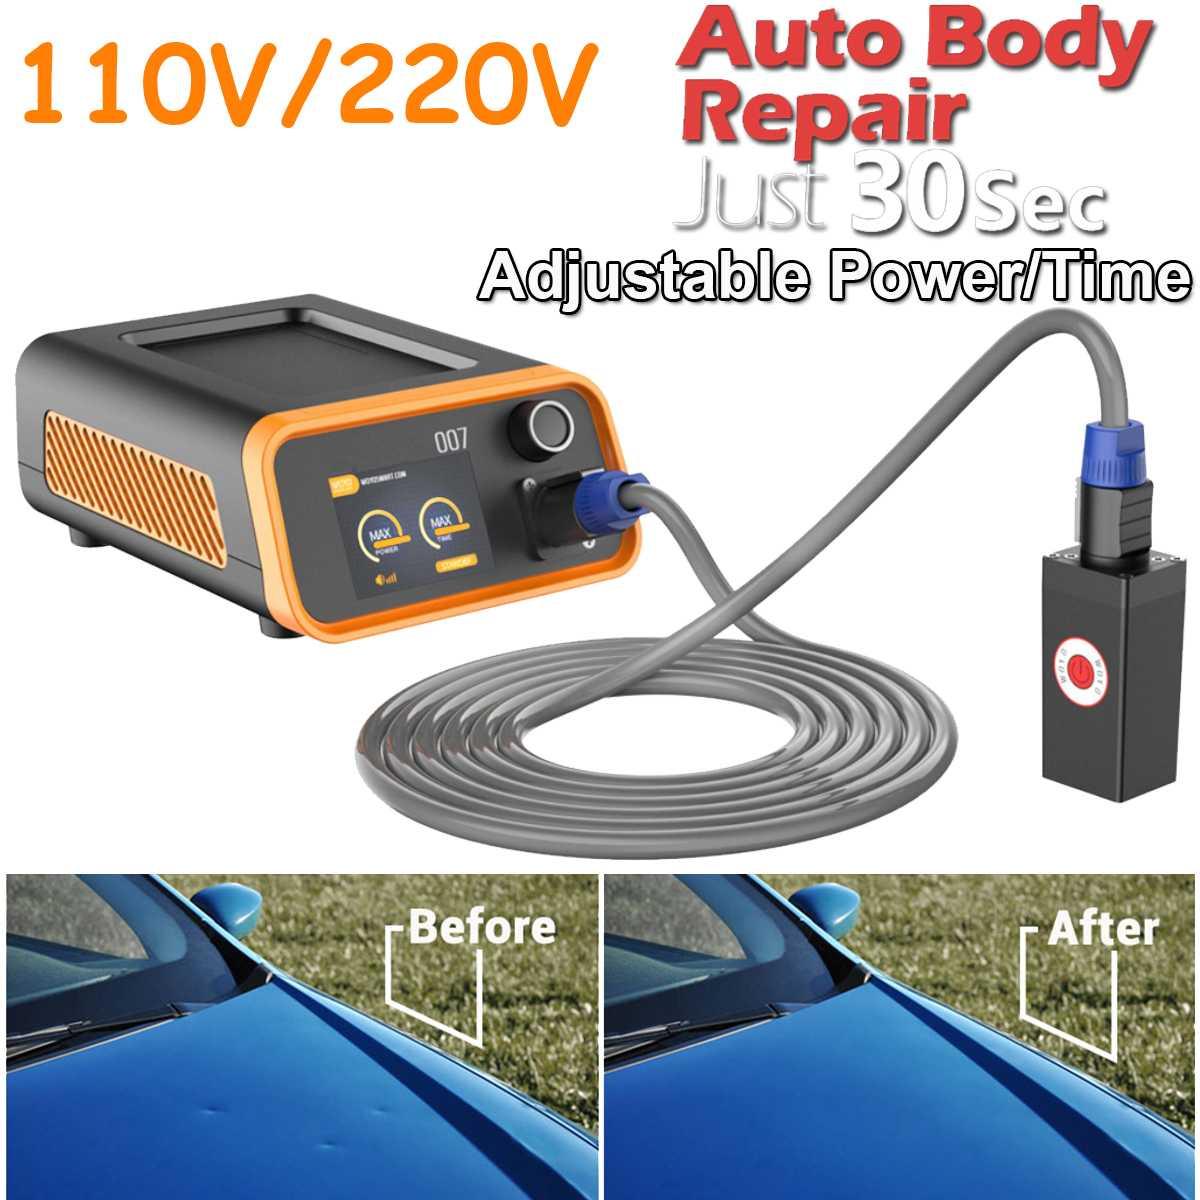 Soft Car Dent Repair Remover Heat Induction System Machine Electro-magnetic Machine Led Light Debosselage Sans Peinture